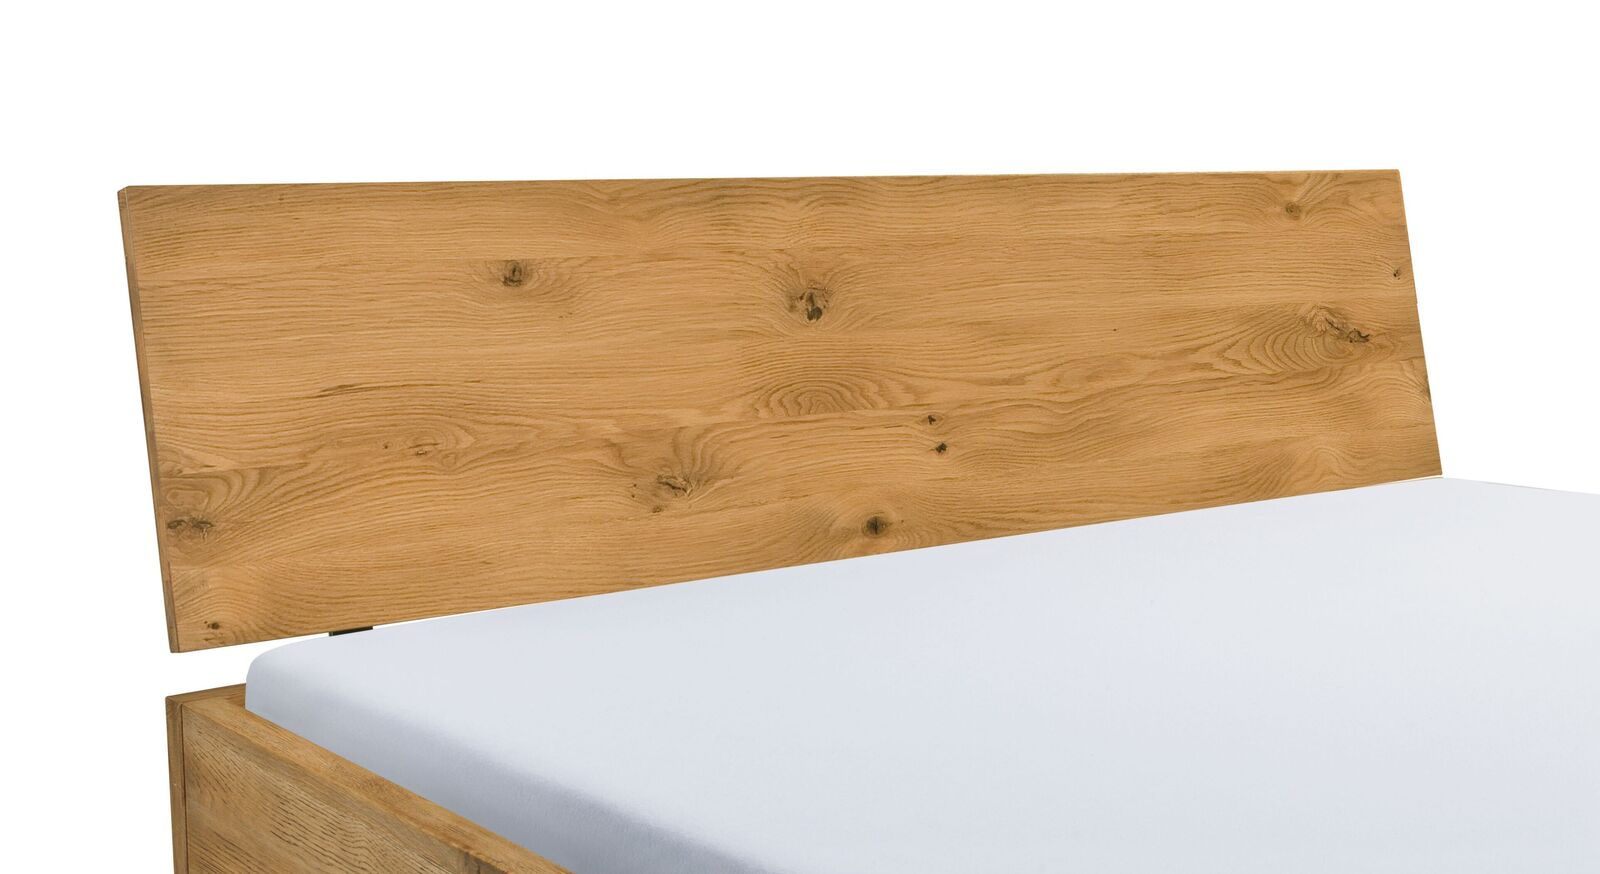 Boxspringbett Kingston mit leicht geneigtem Holzkopfteil